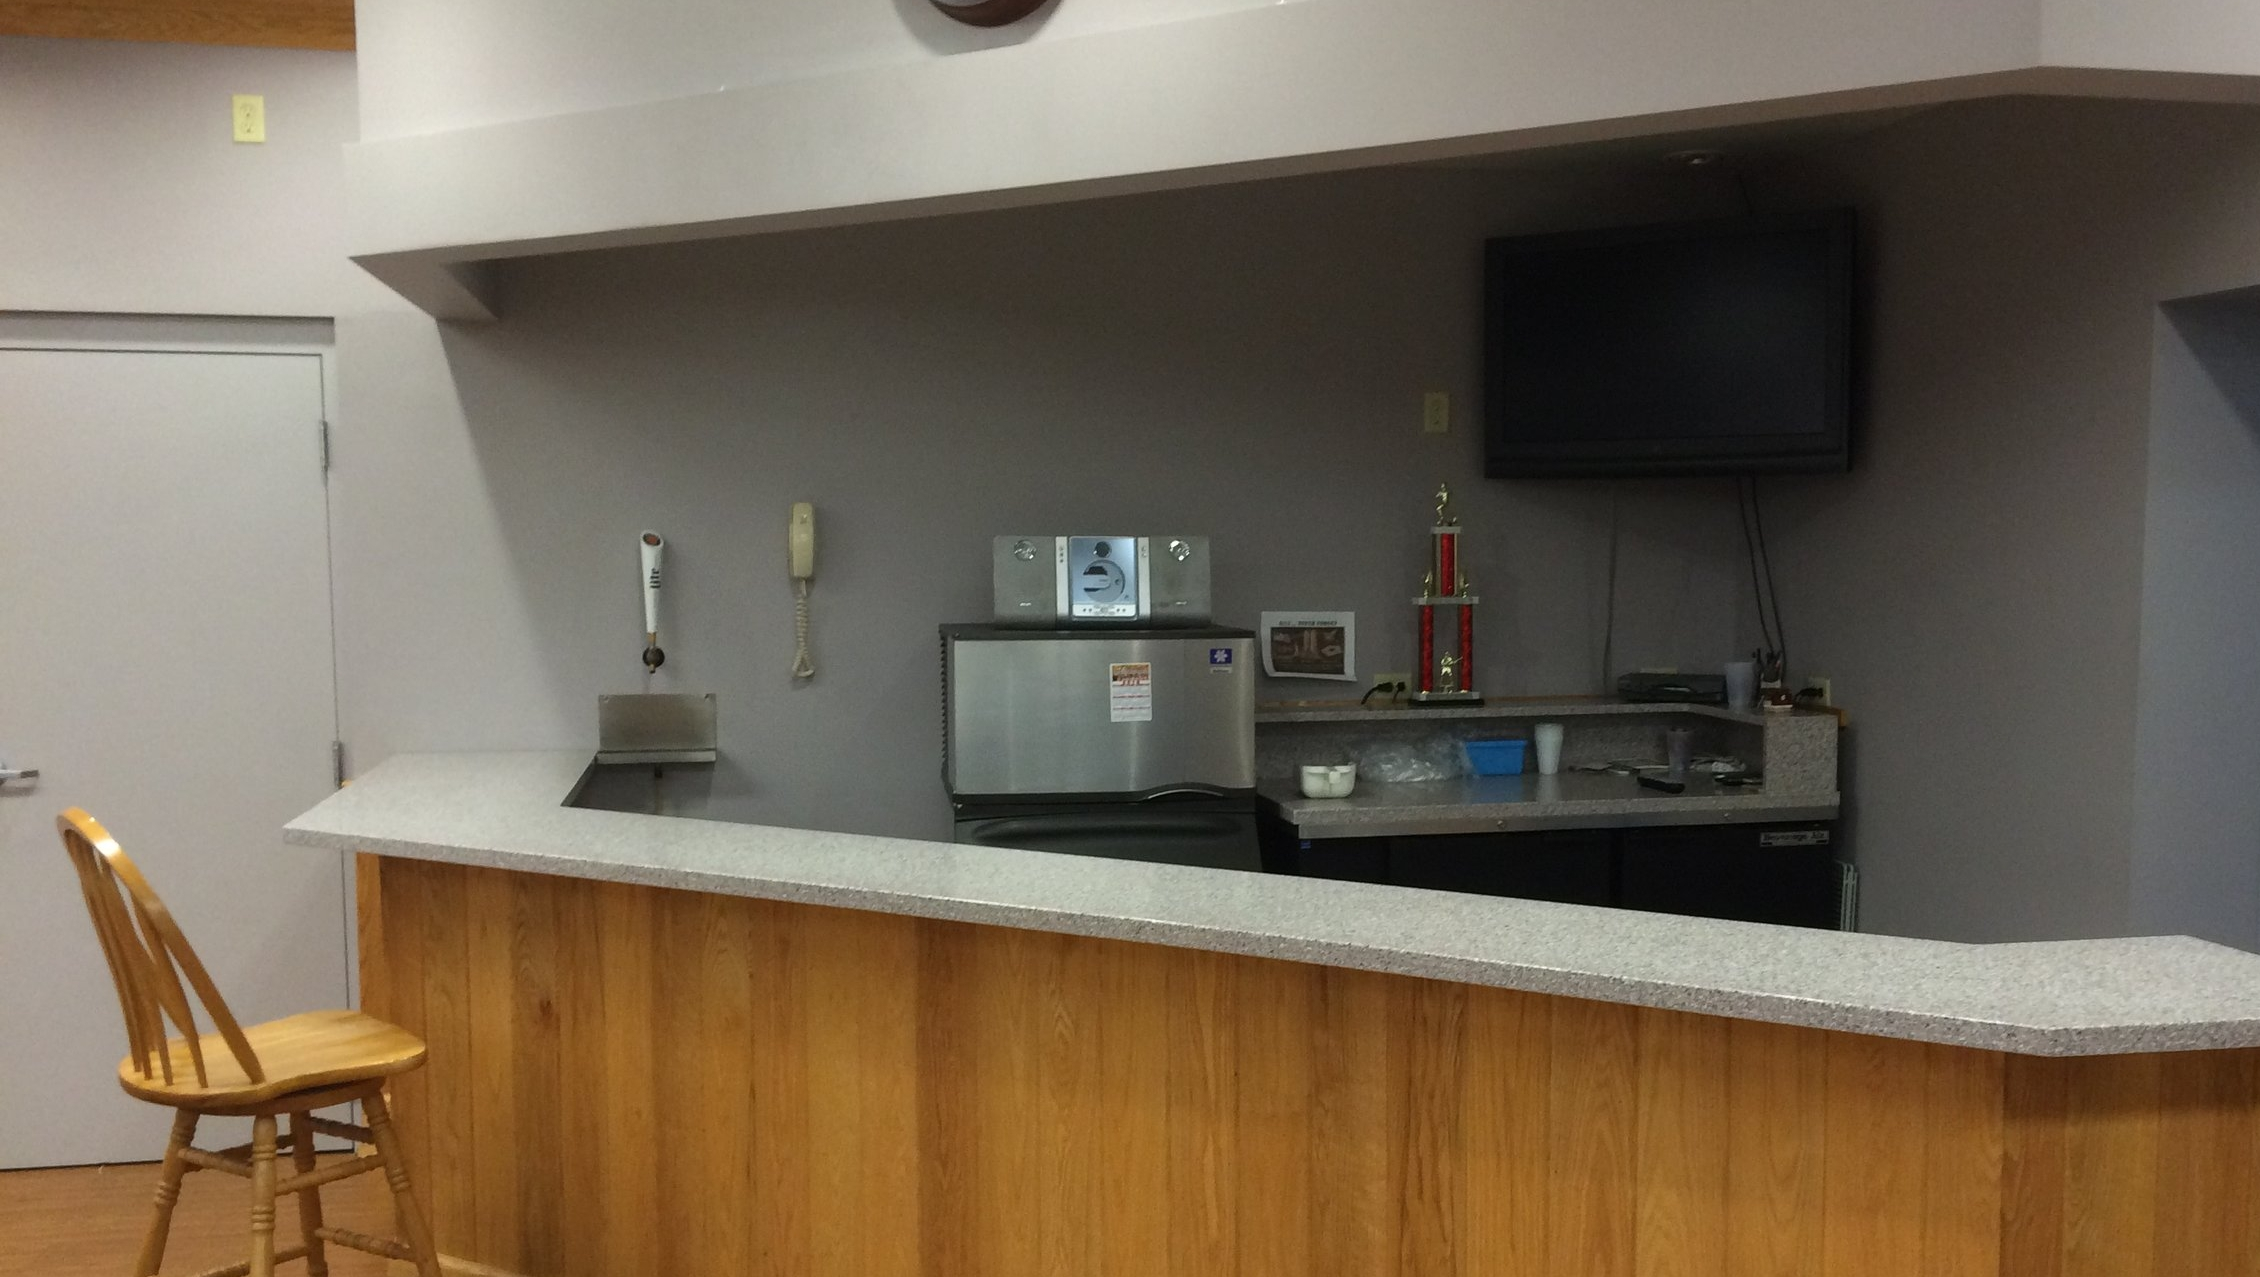 Bar area with ice machine and mini-fridge